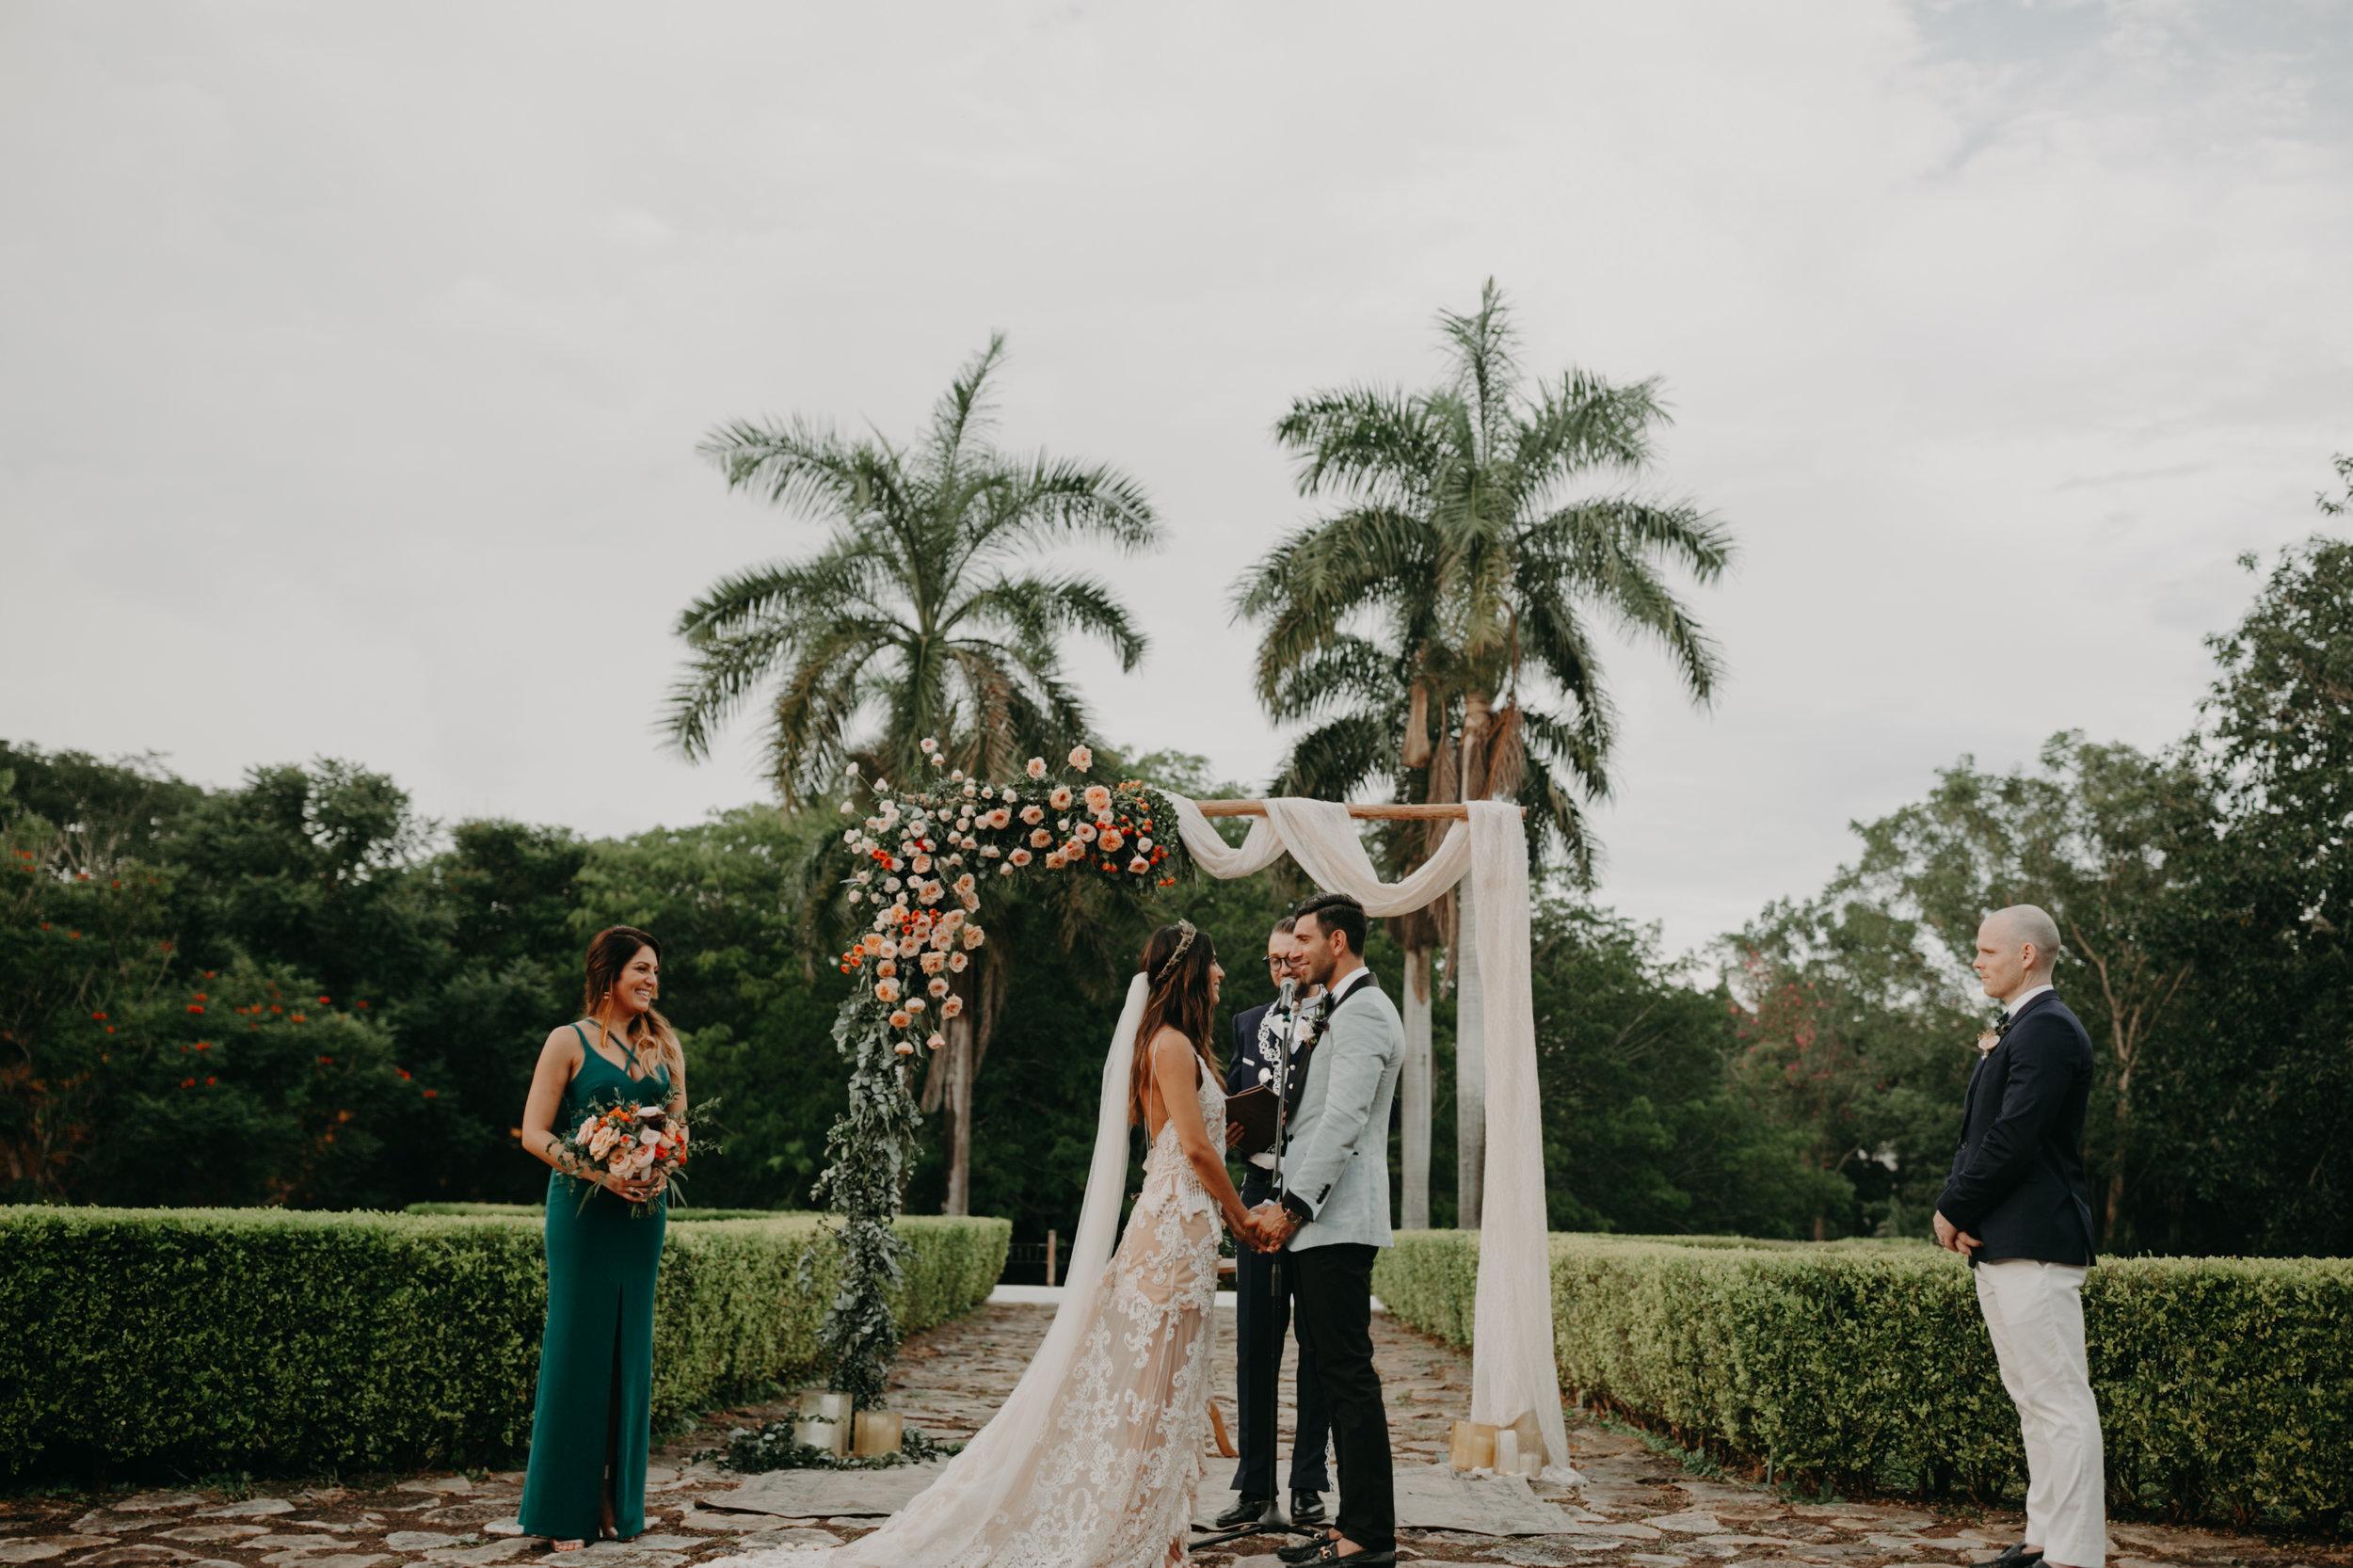 Hacienda Temozon Yucatan Mexico Wedding | Ida & Peter Emily Magers Photography-1051.jpg